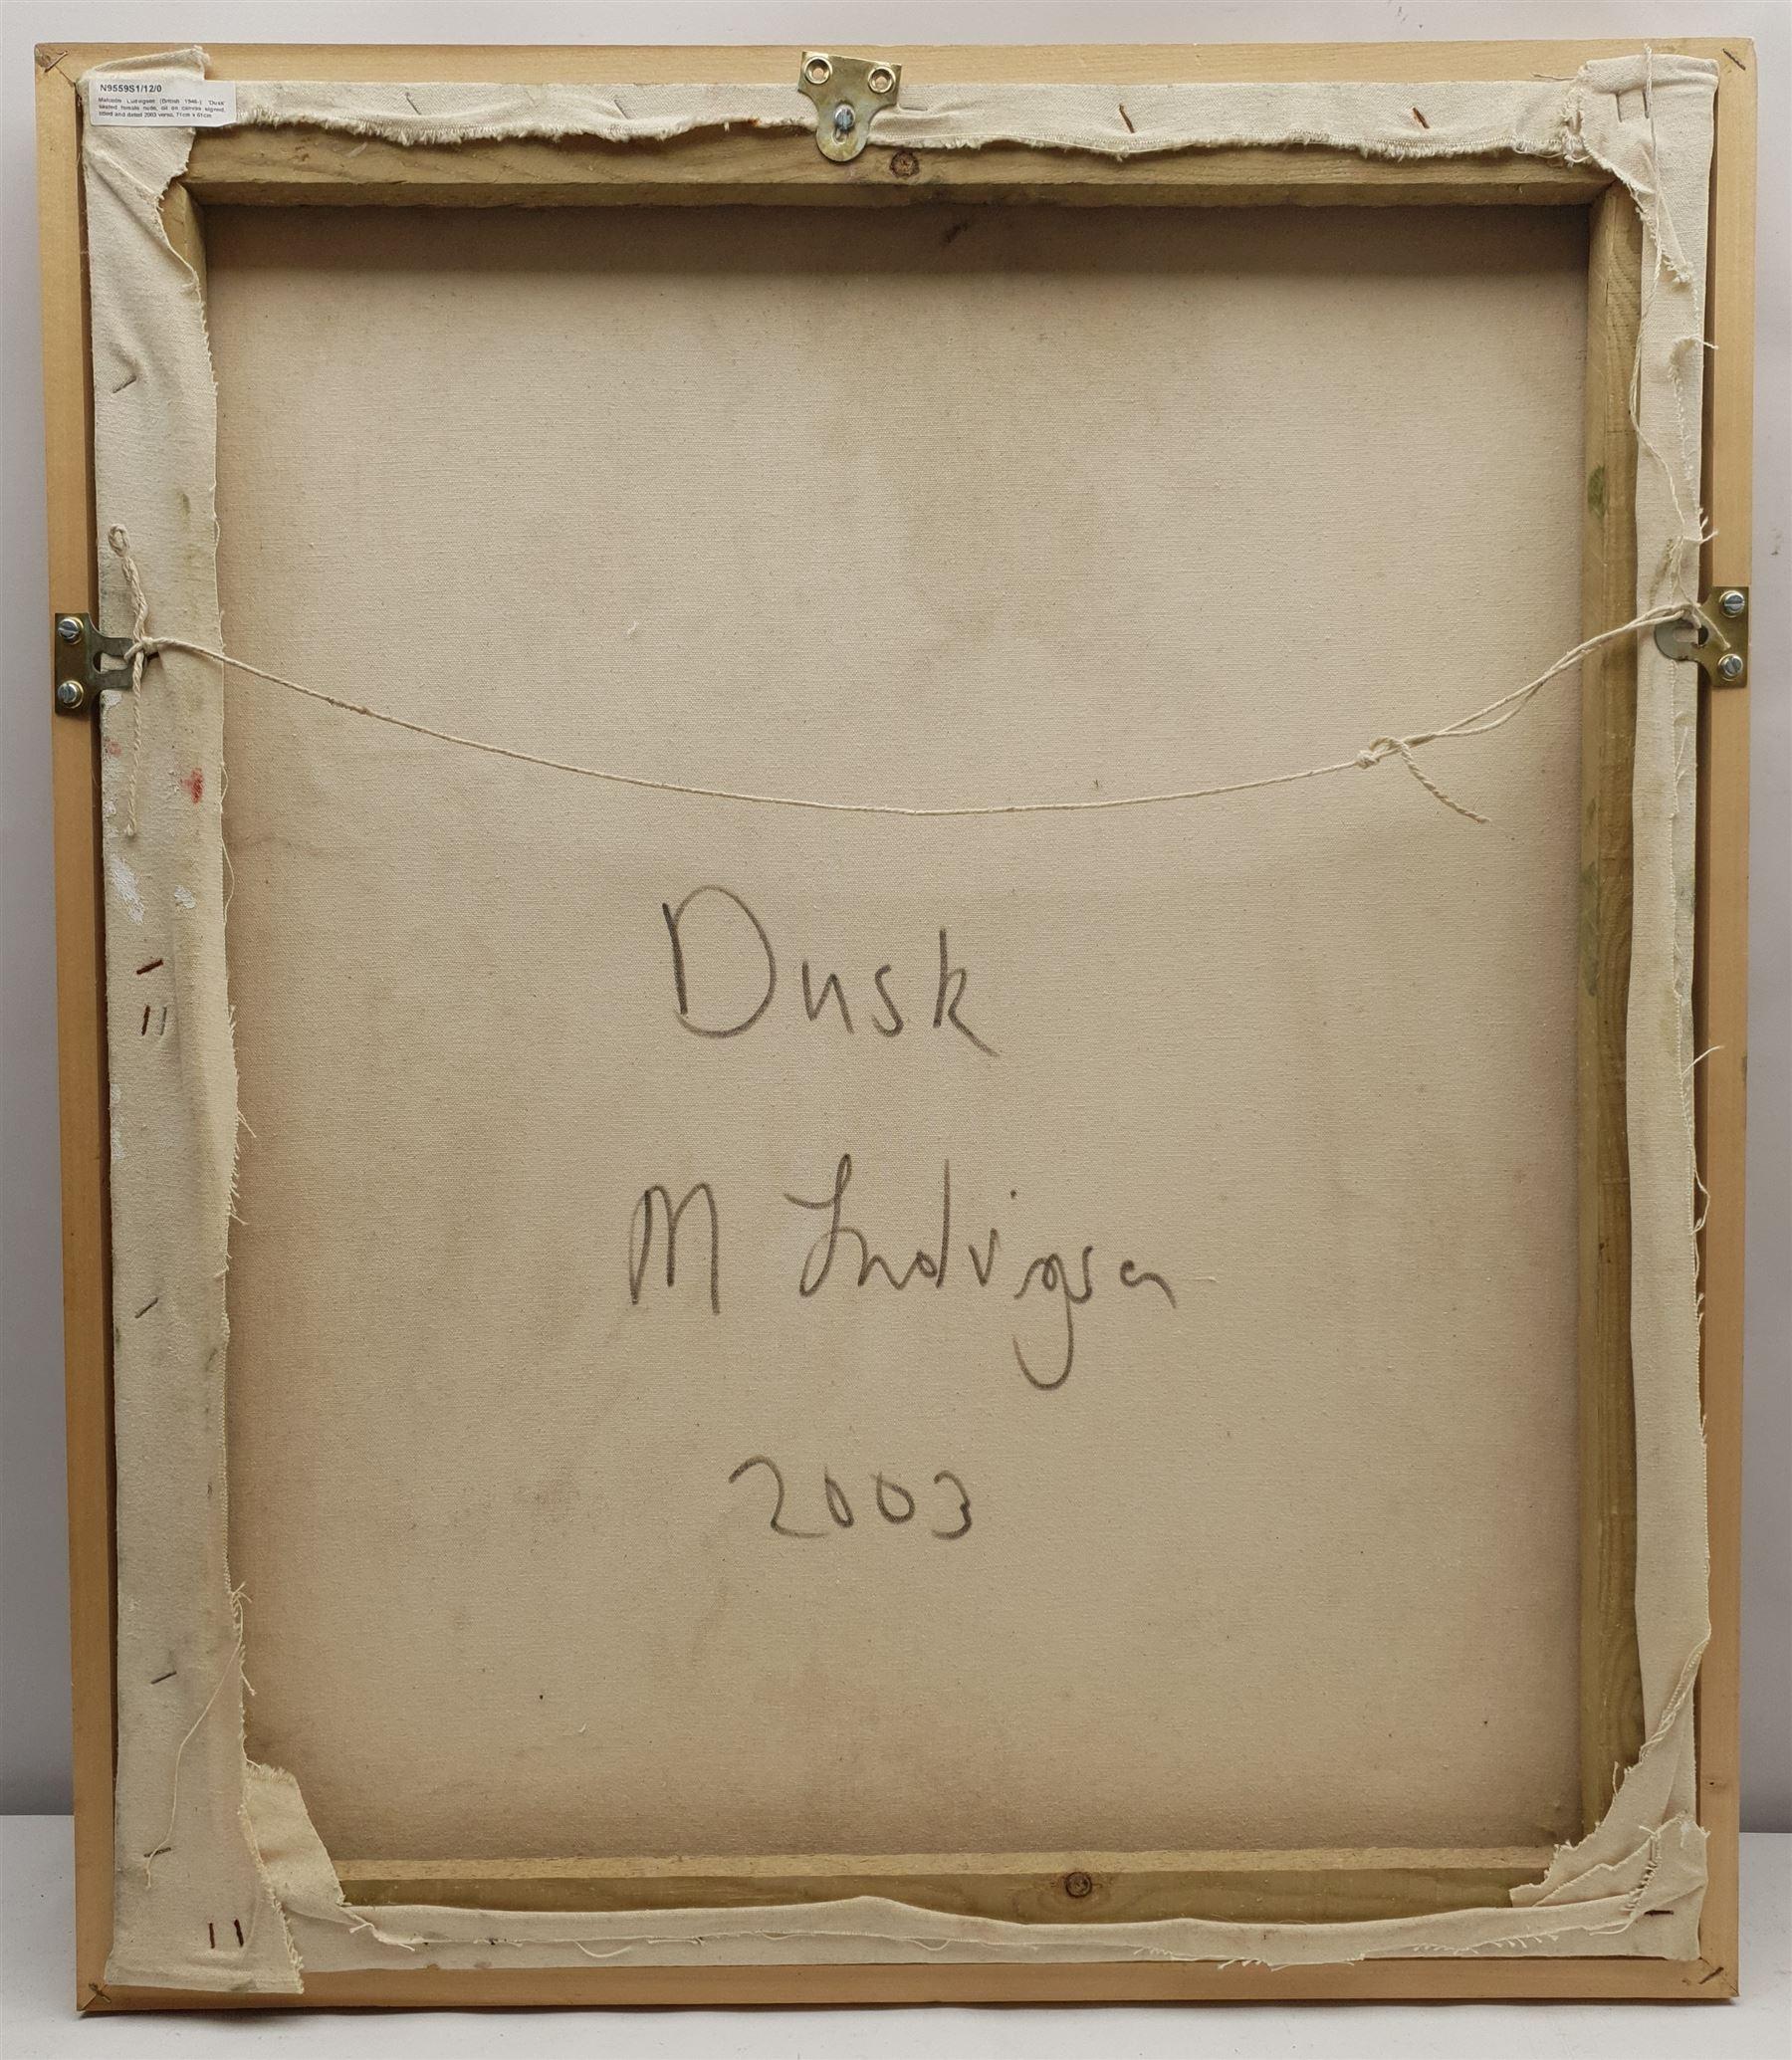 Malcolm Ludvigsen (British 1946-): 'Dusk' - Image 3 of 3